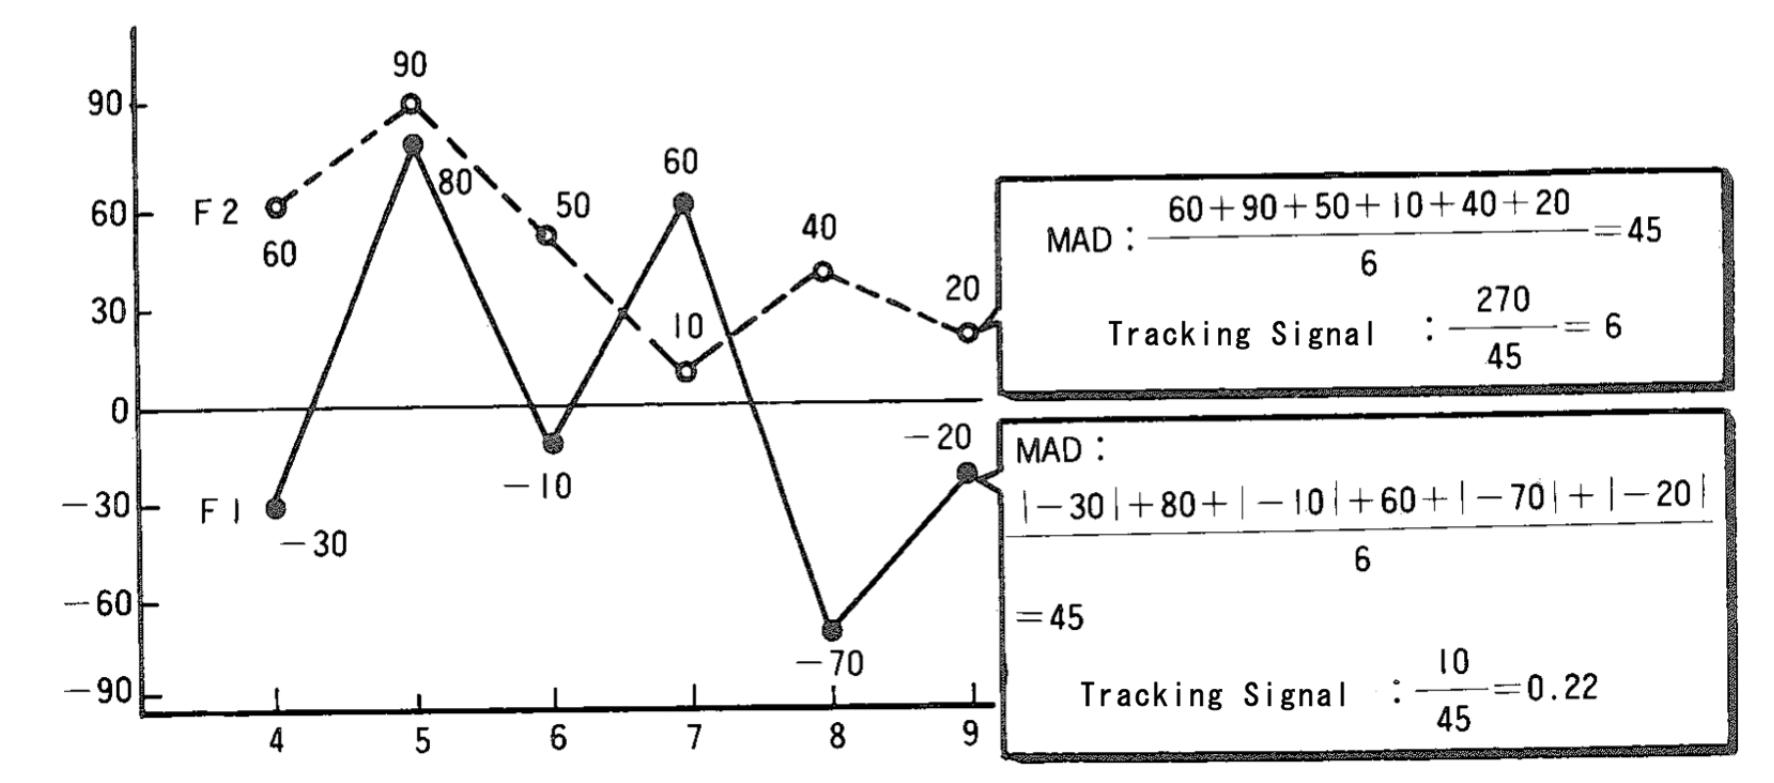 Tracking Signal - Demand Forecast - MRP glossary of